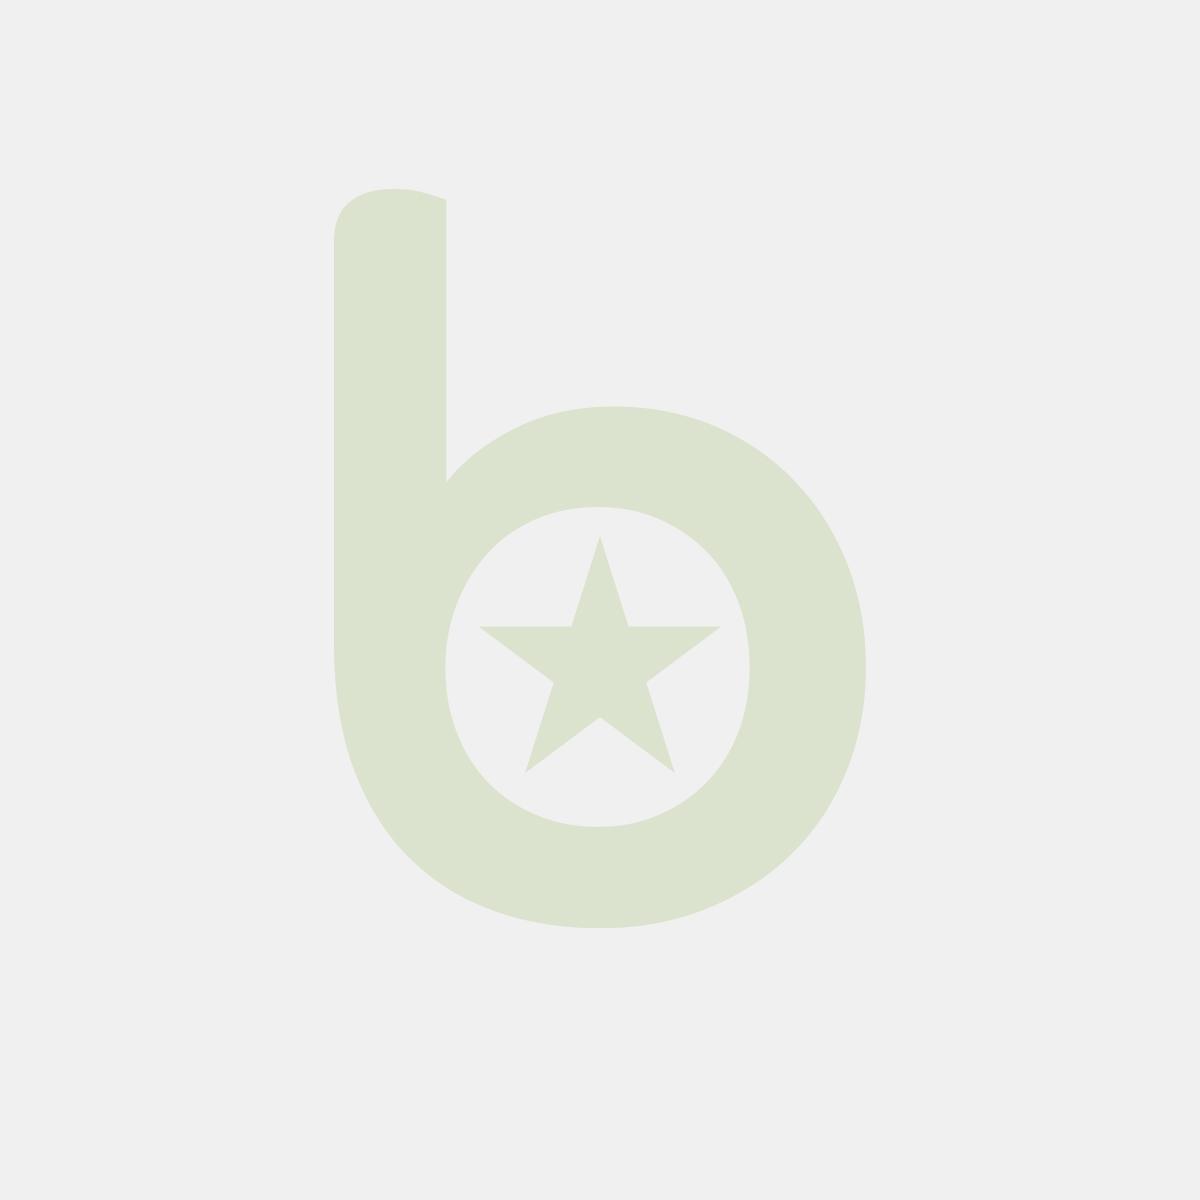 K BO18 miska bezbarwna PP 1000ml op.50szt (8)